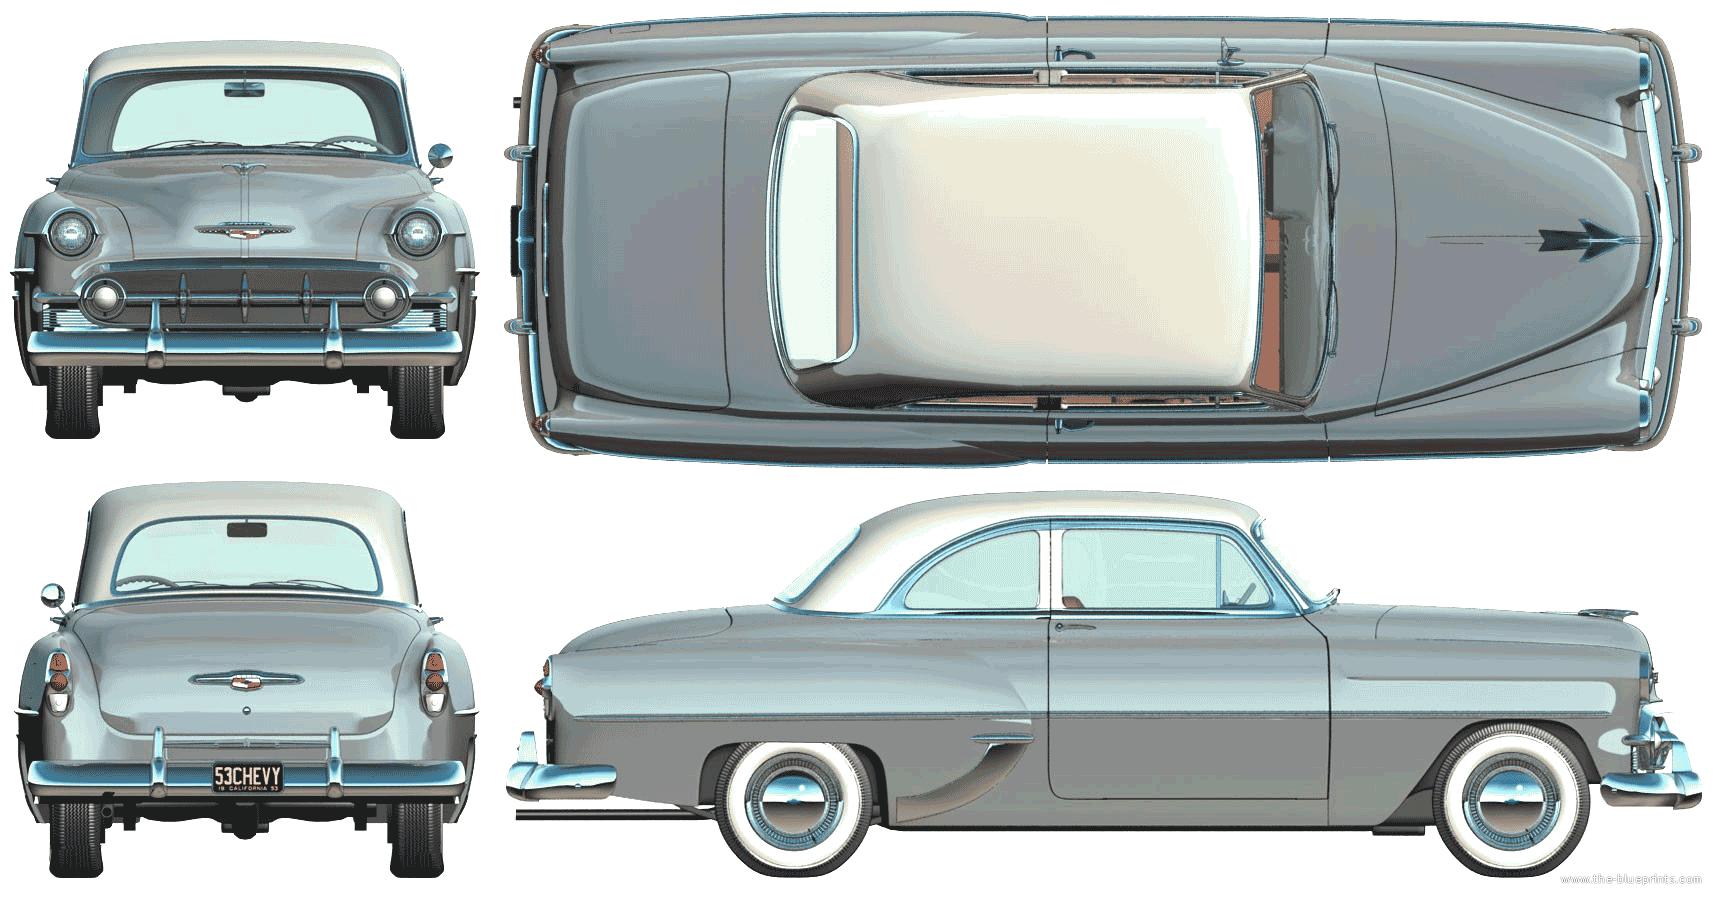 Blueprints cars chevrolet chevrolet 210 2 door club sedan 1953 chevrolet 210 2 door club sedan 1953 malvernweather Choice Image